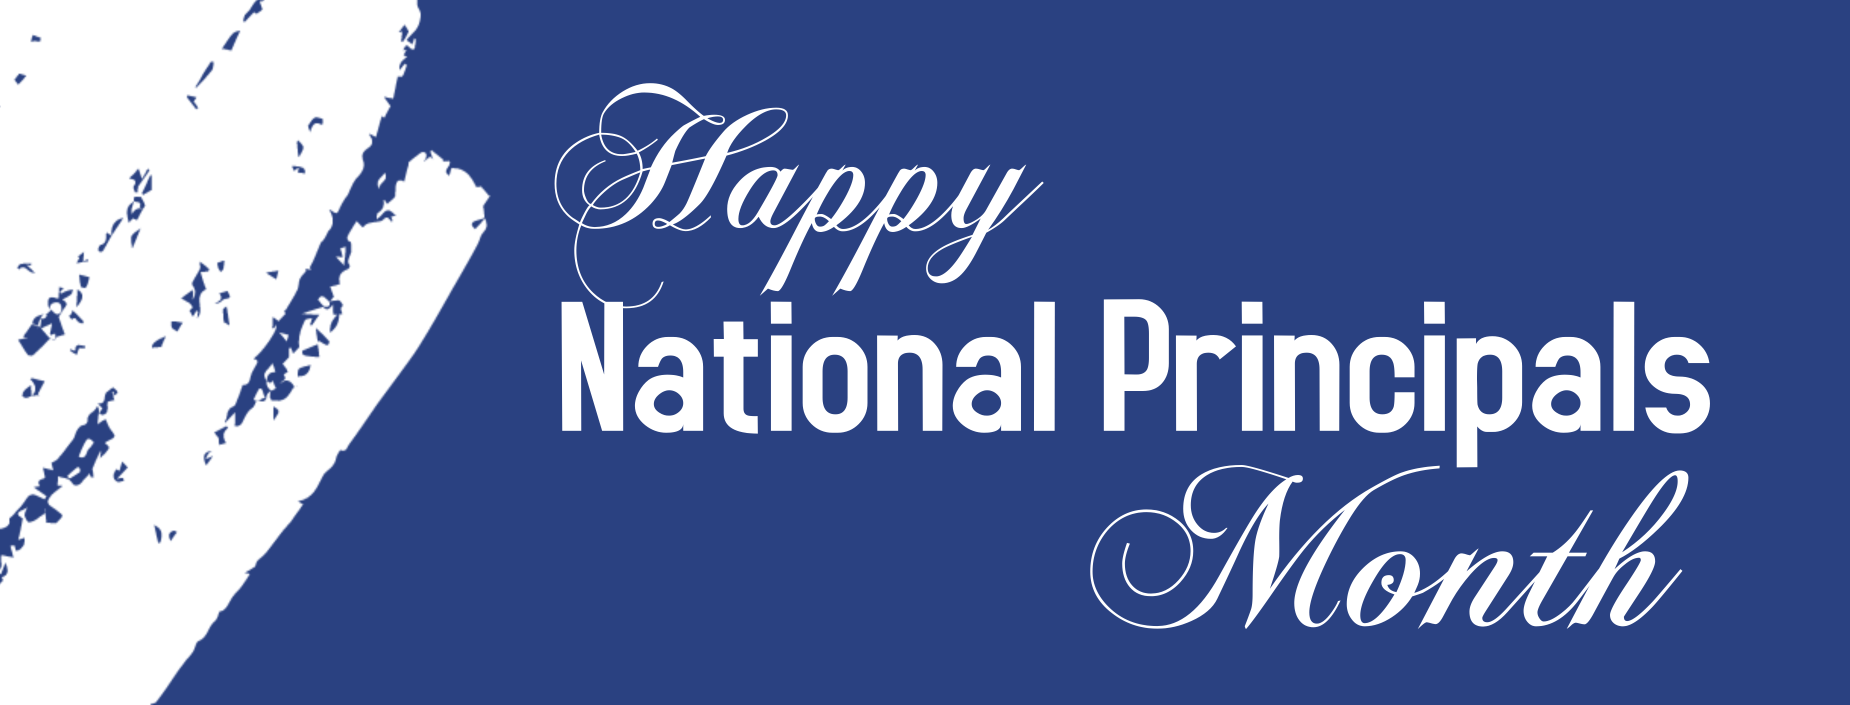 Happy National Principals Month